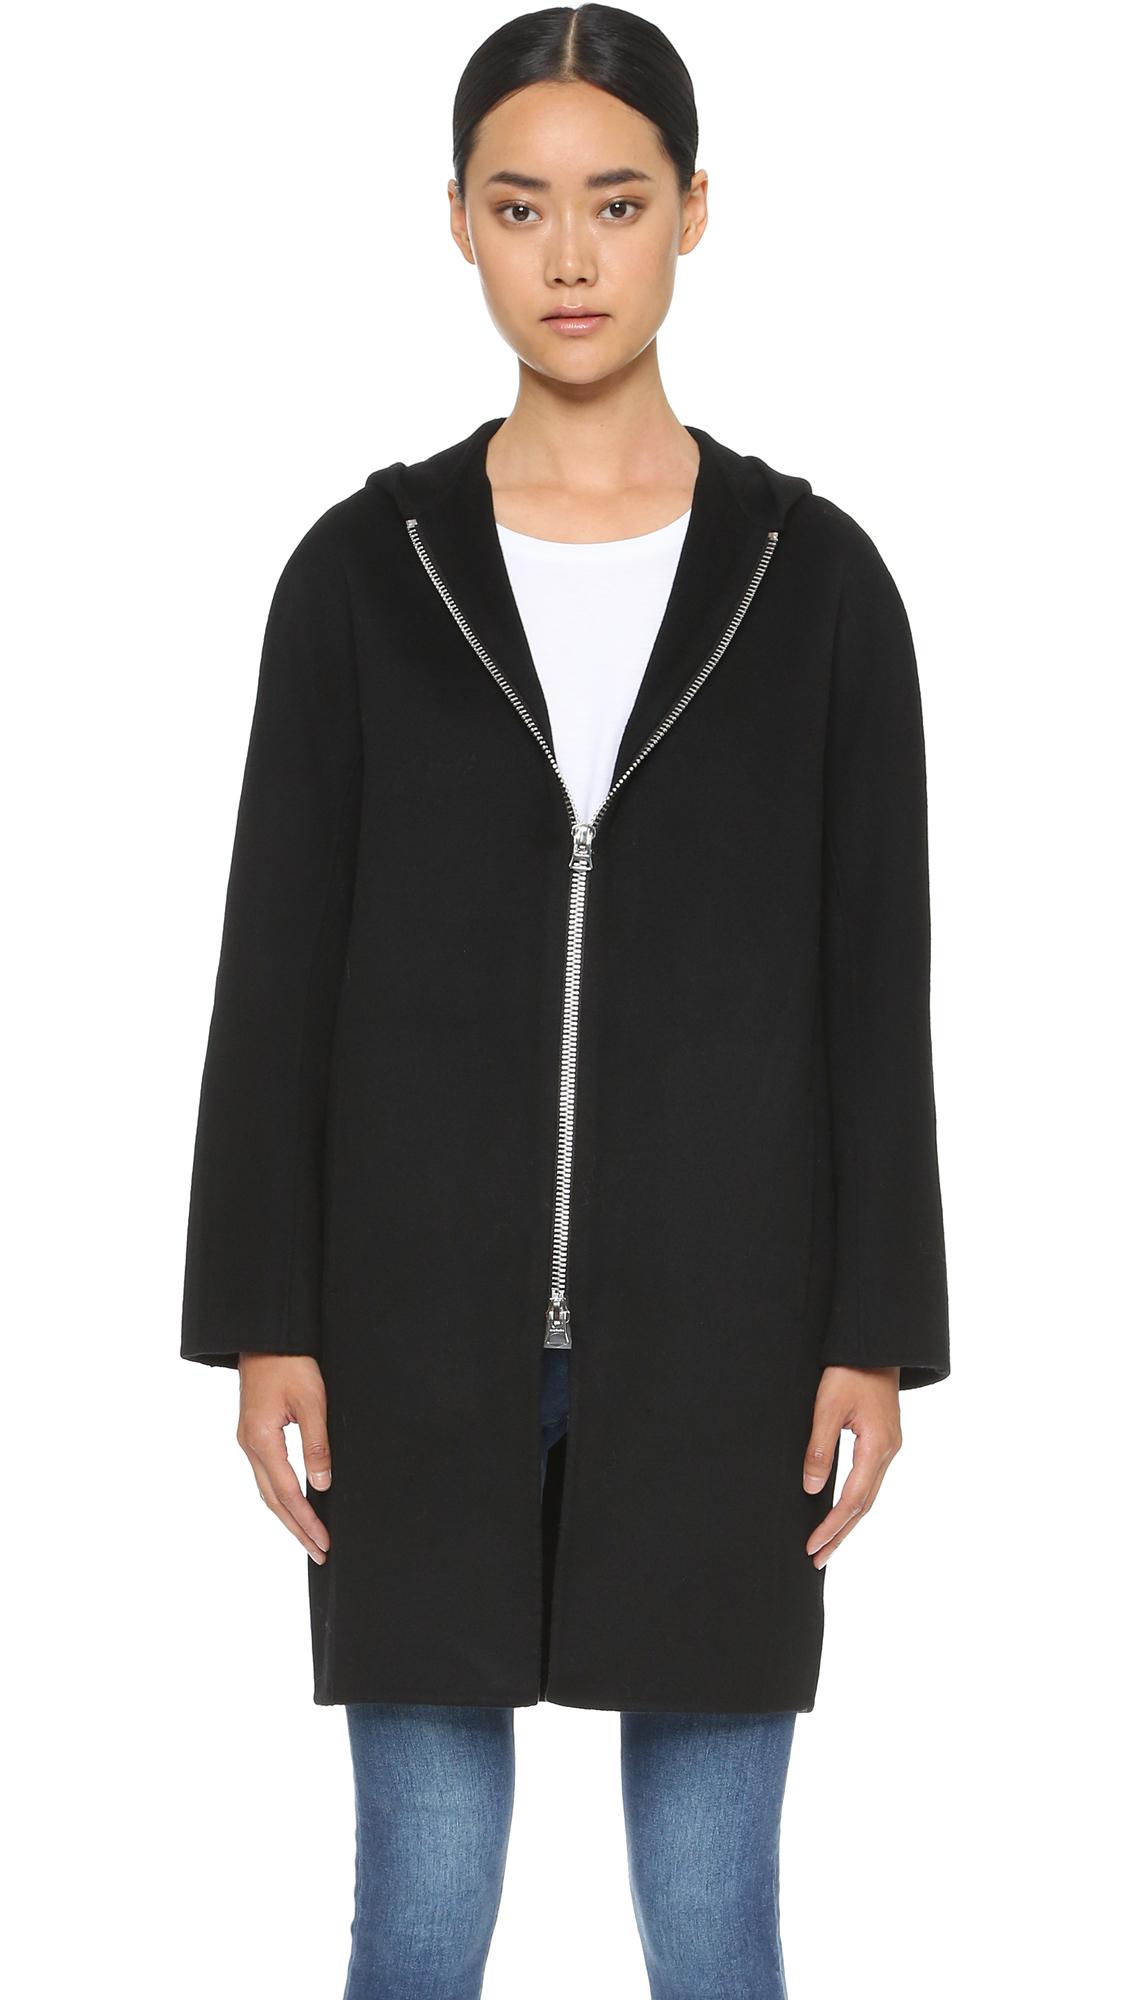 Acne Emile Hooded Coat - Black in Black | Lyst